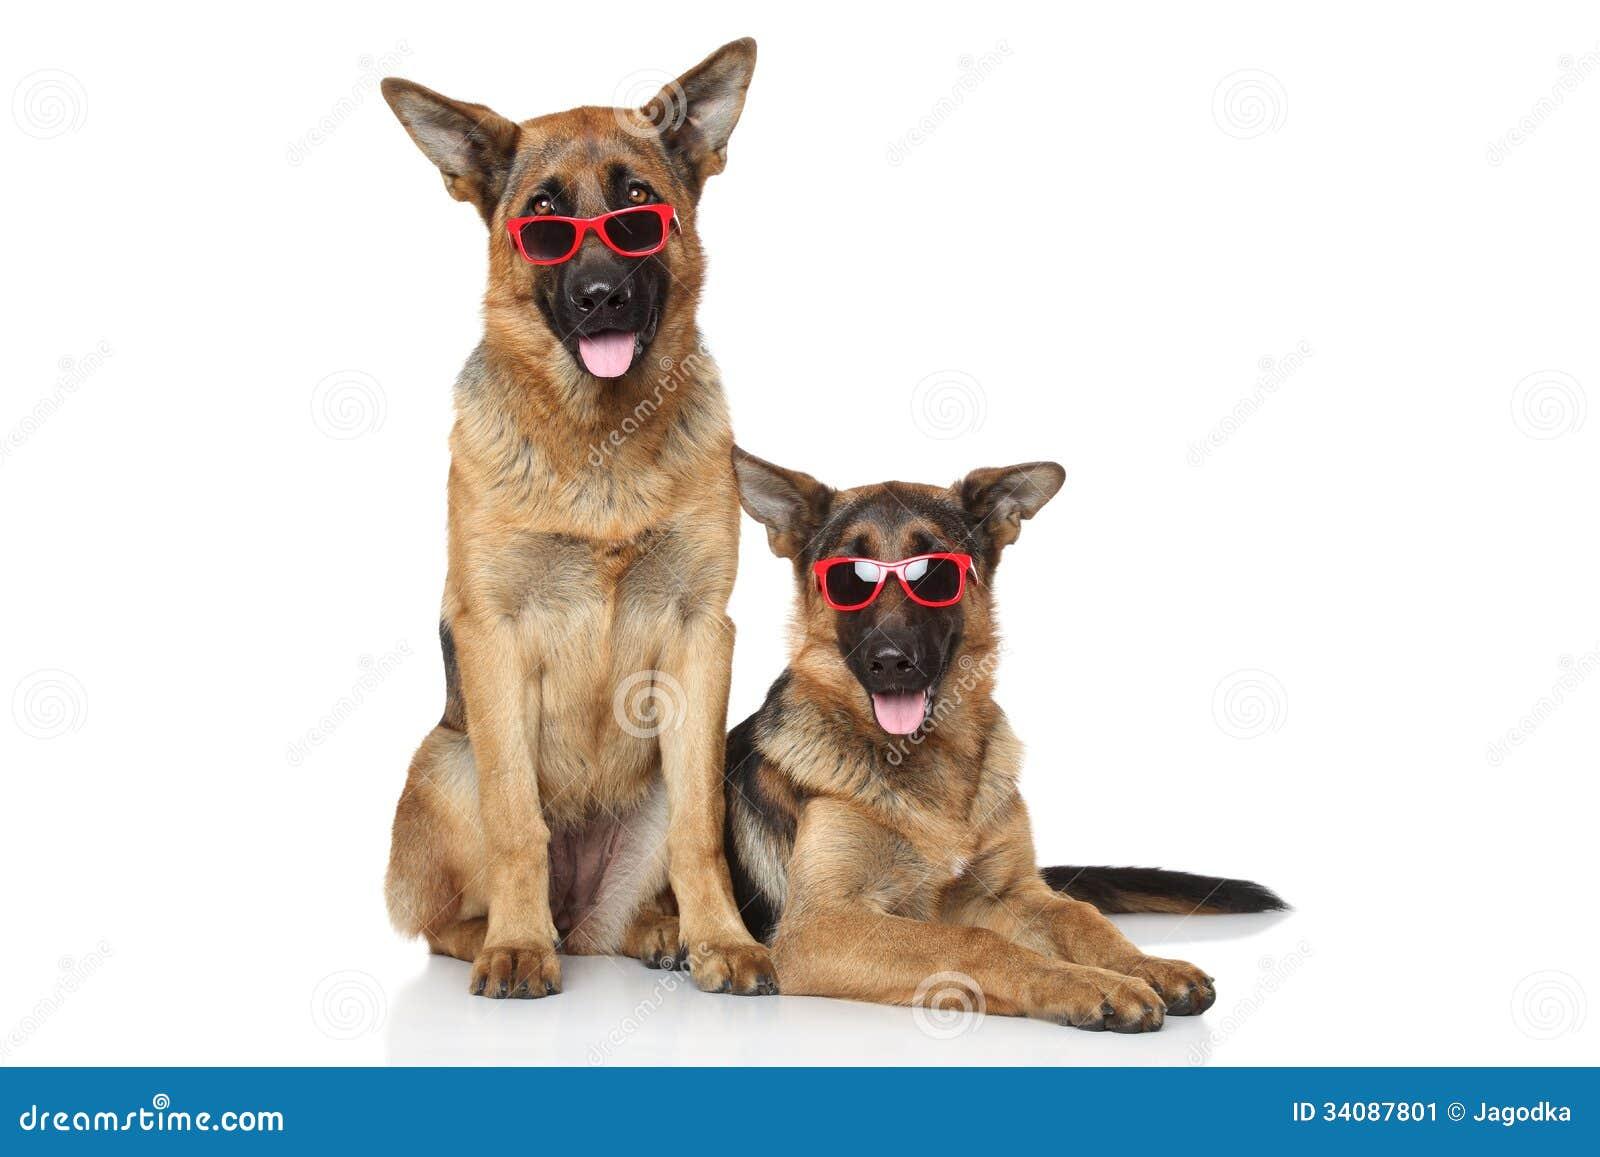 Funny German Shepherd dogs in sunglasses